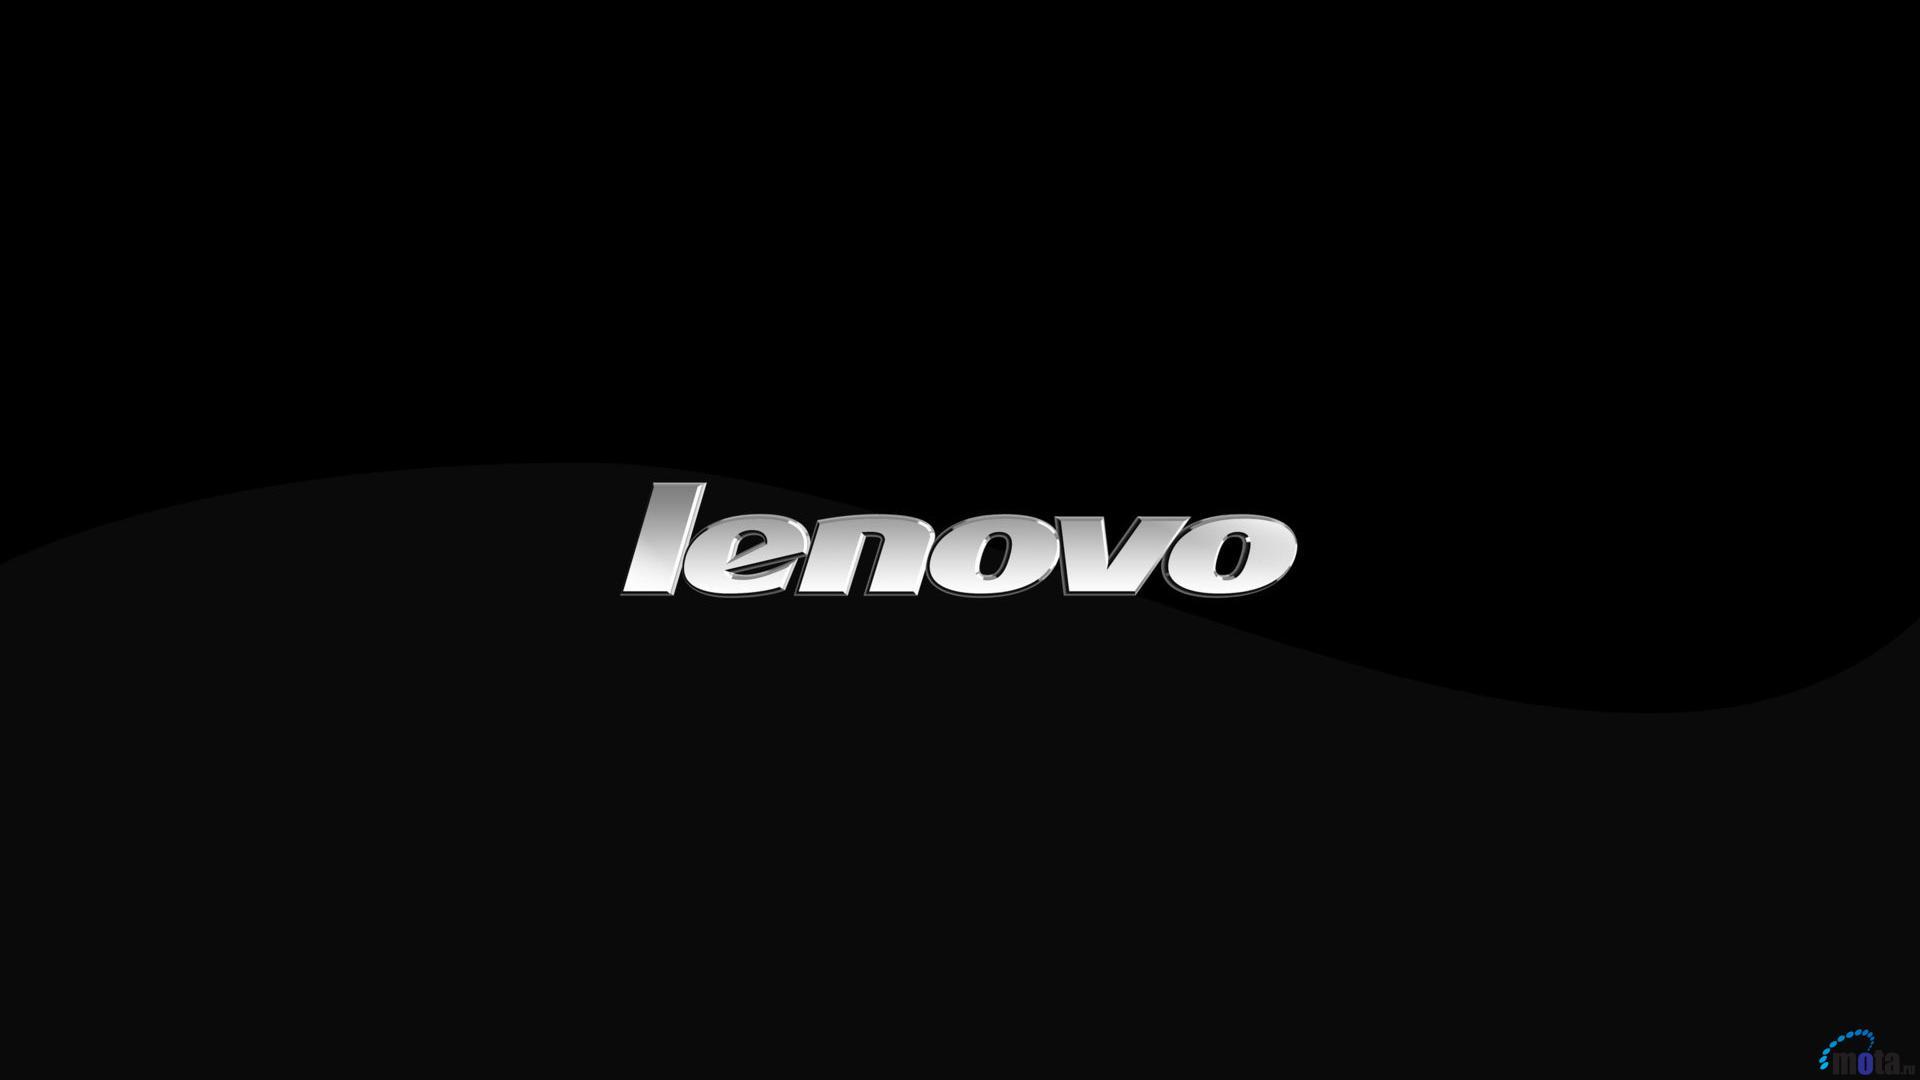 Kitchen desktop wallpaper - Lenovo Wallpaper Wallpapersafari